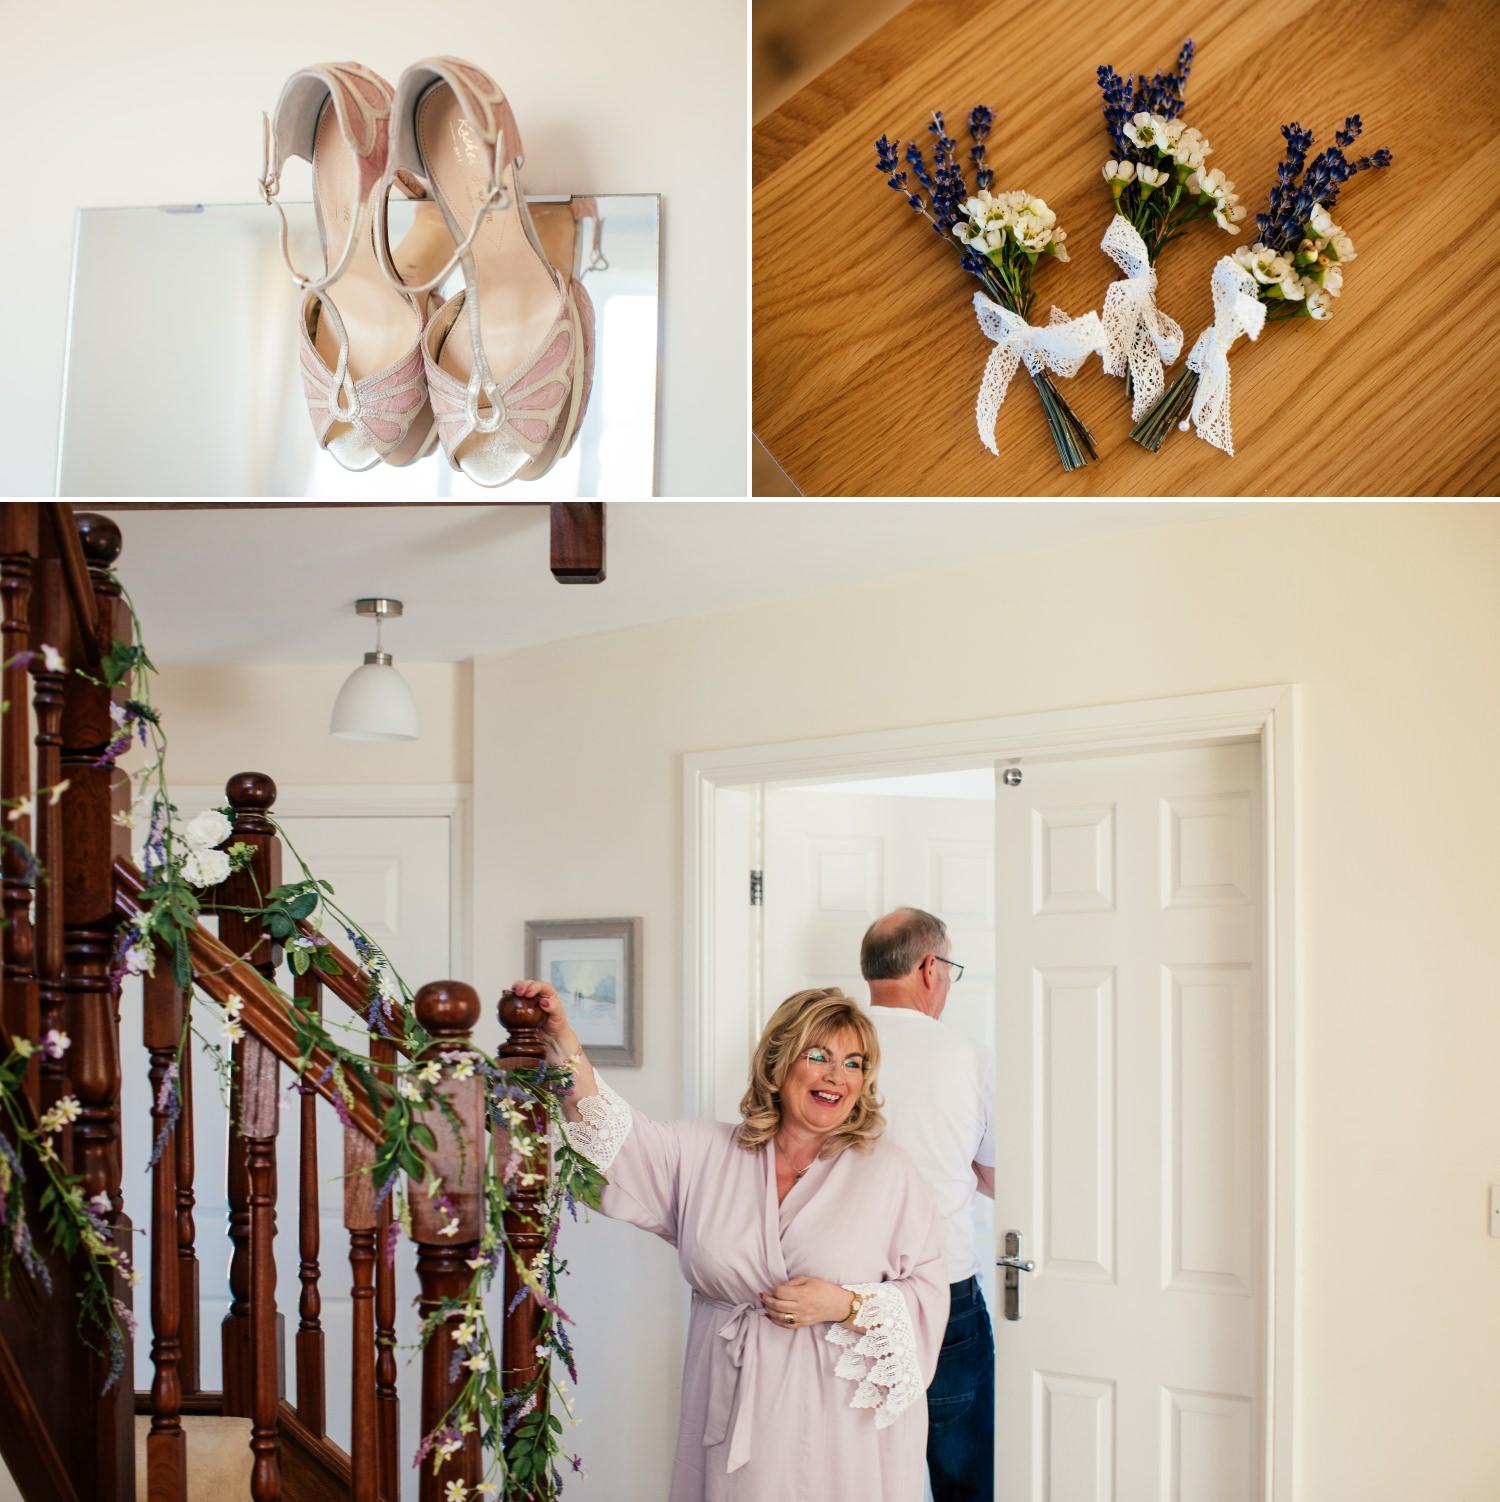 Plas Hafod Wedding details photographs